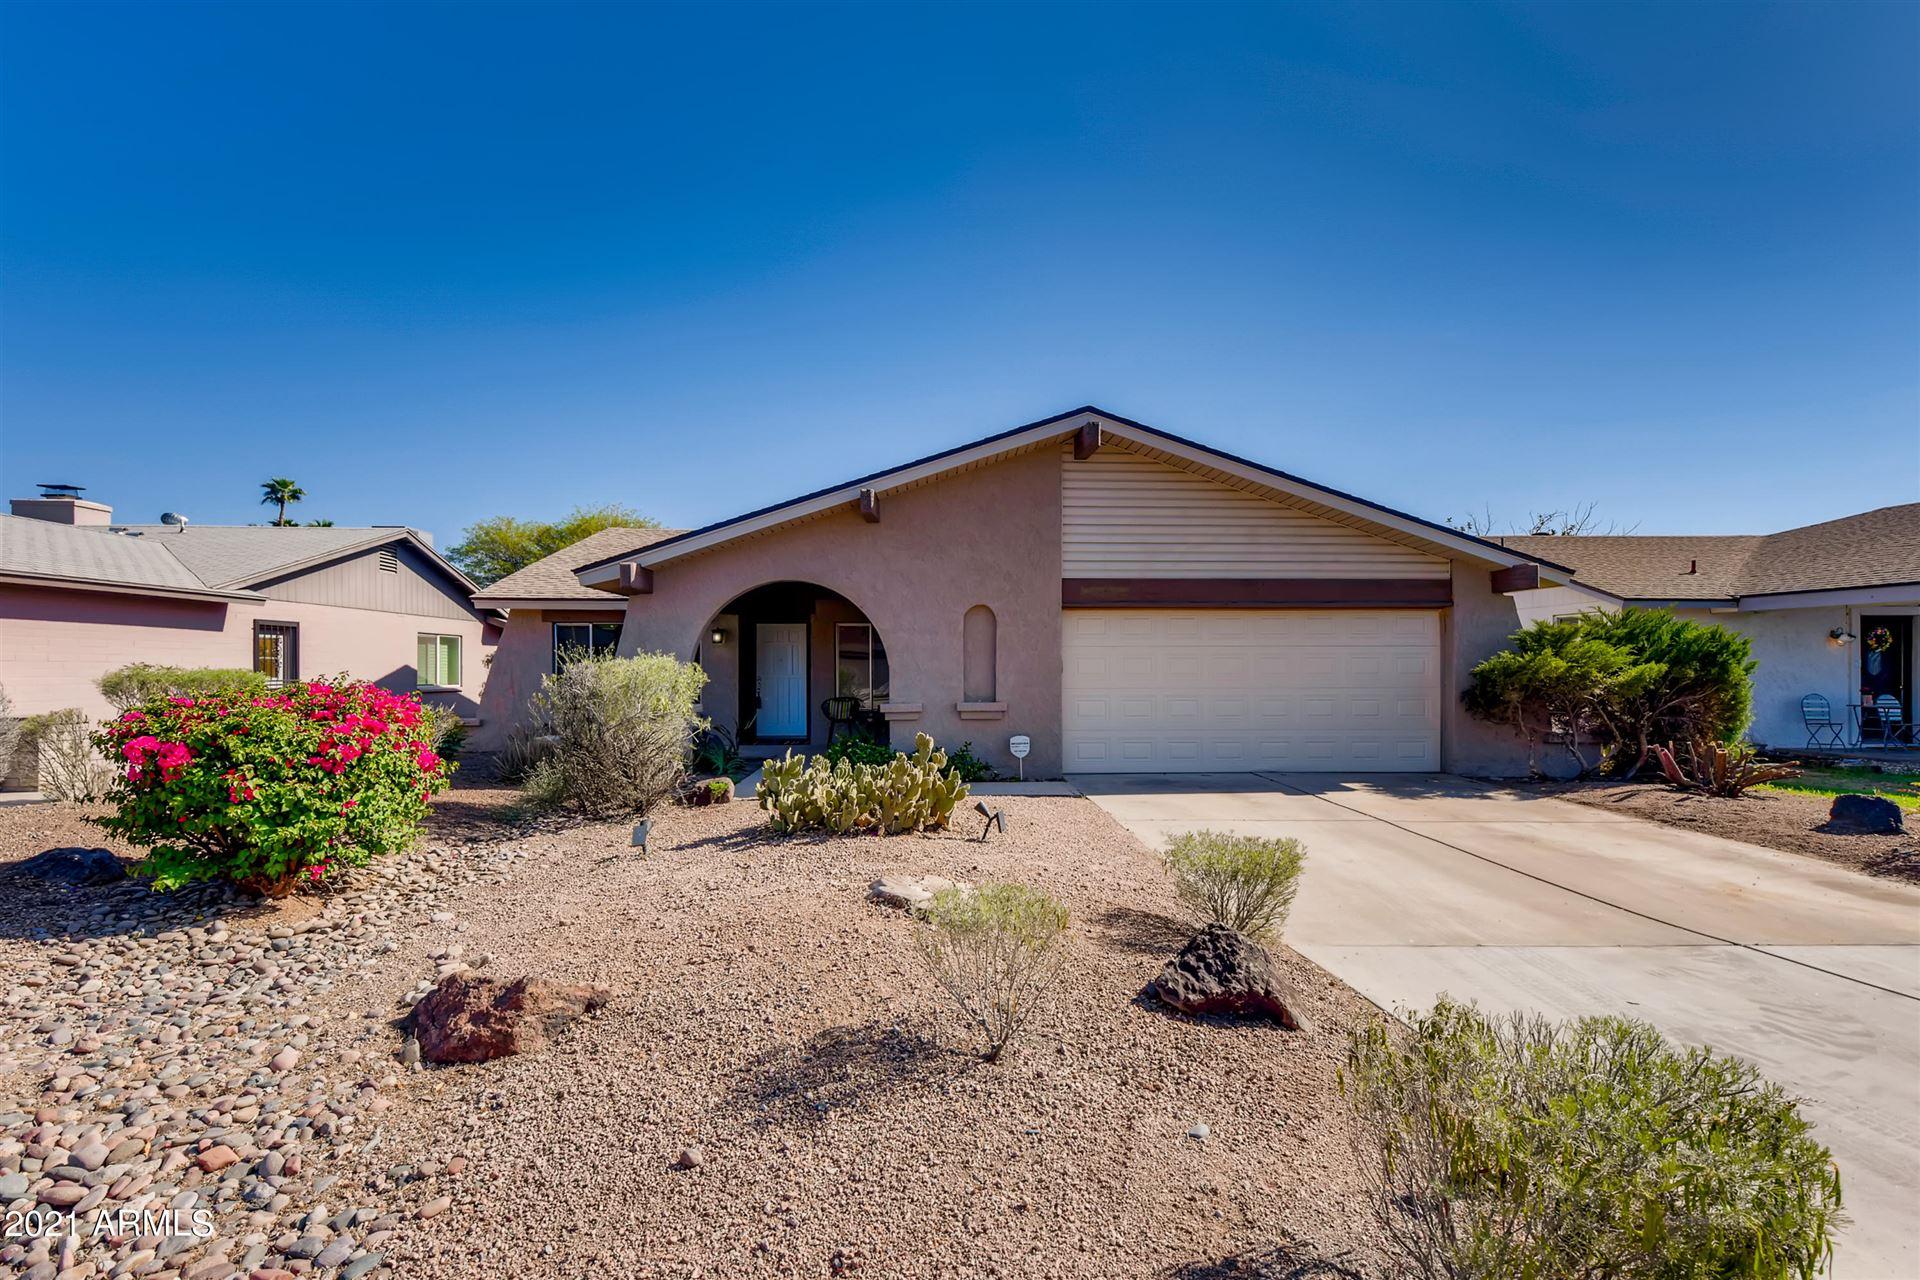 1861 E HARVARD Drive, Tempe, AZ 85283 - MLS#: 6221947